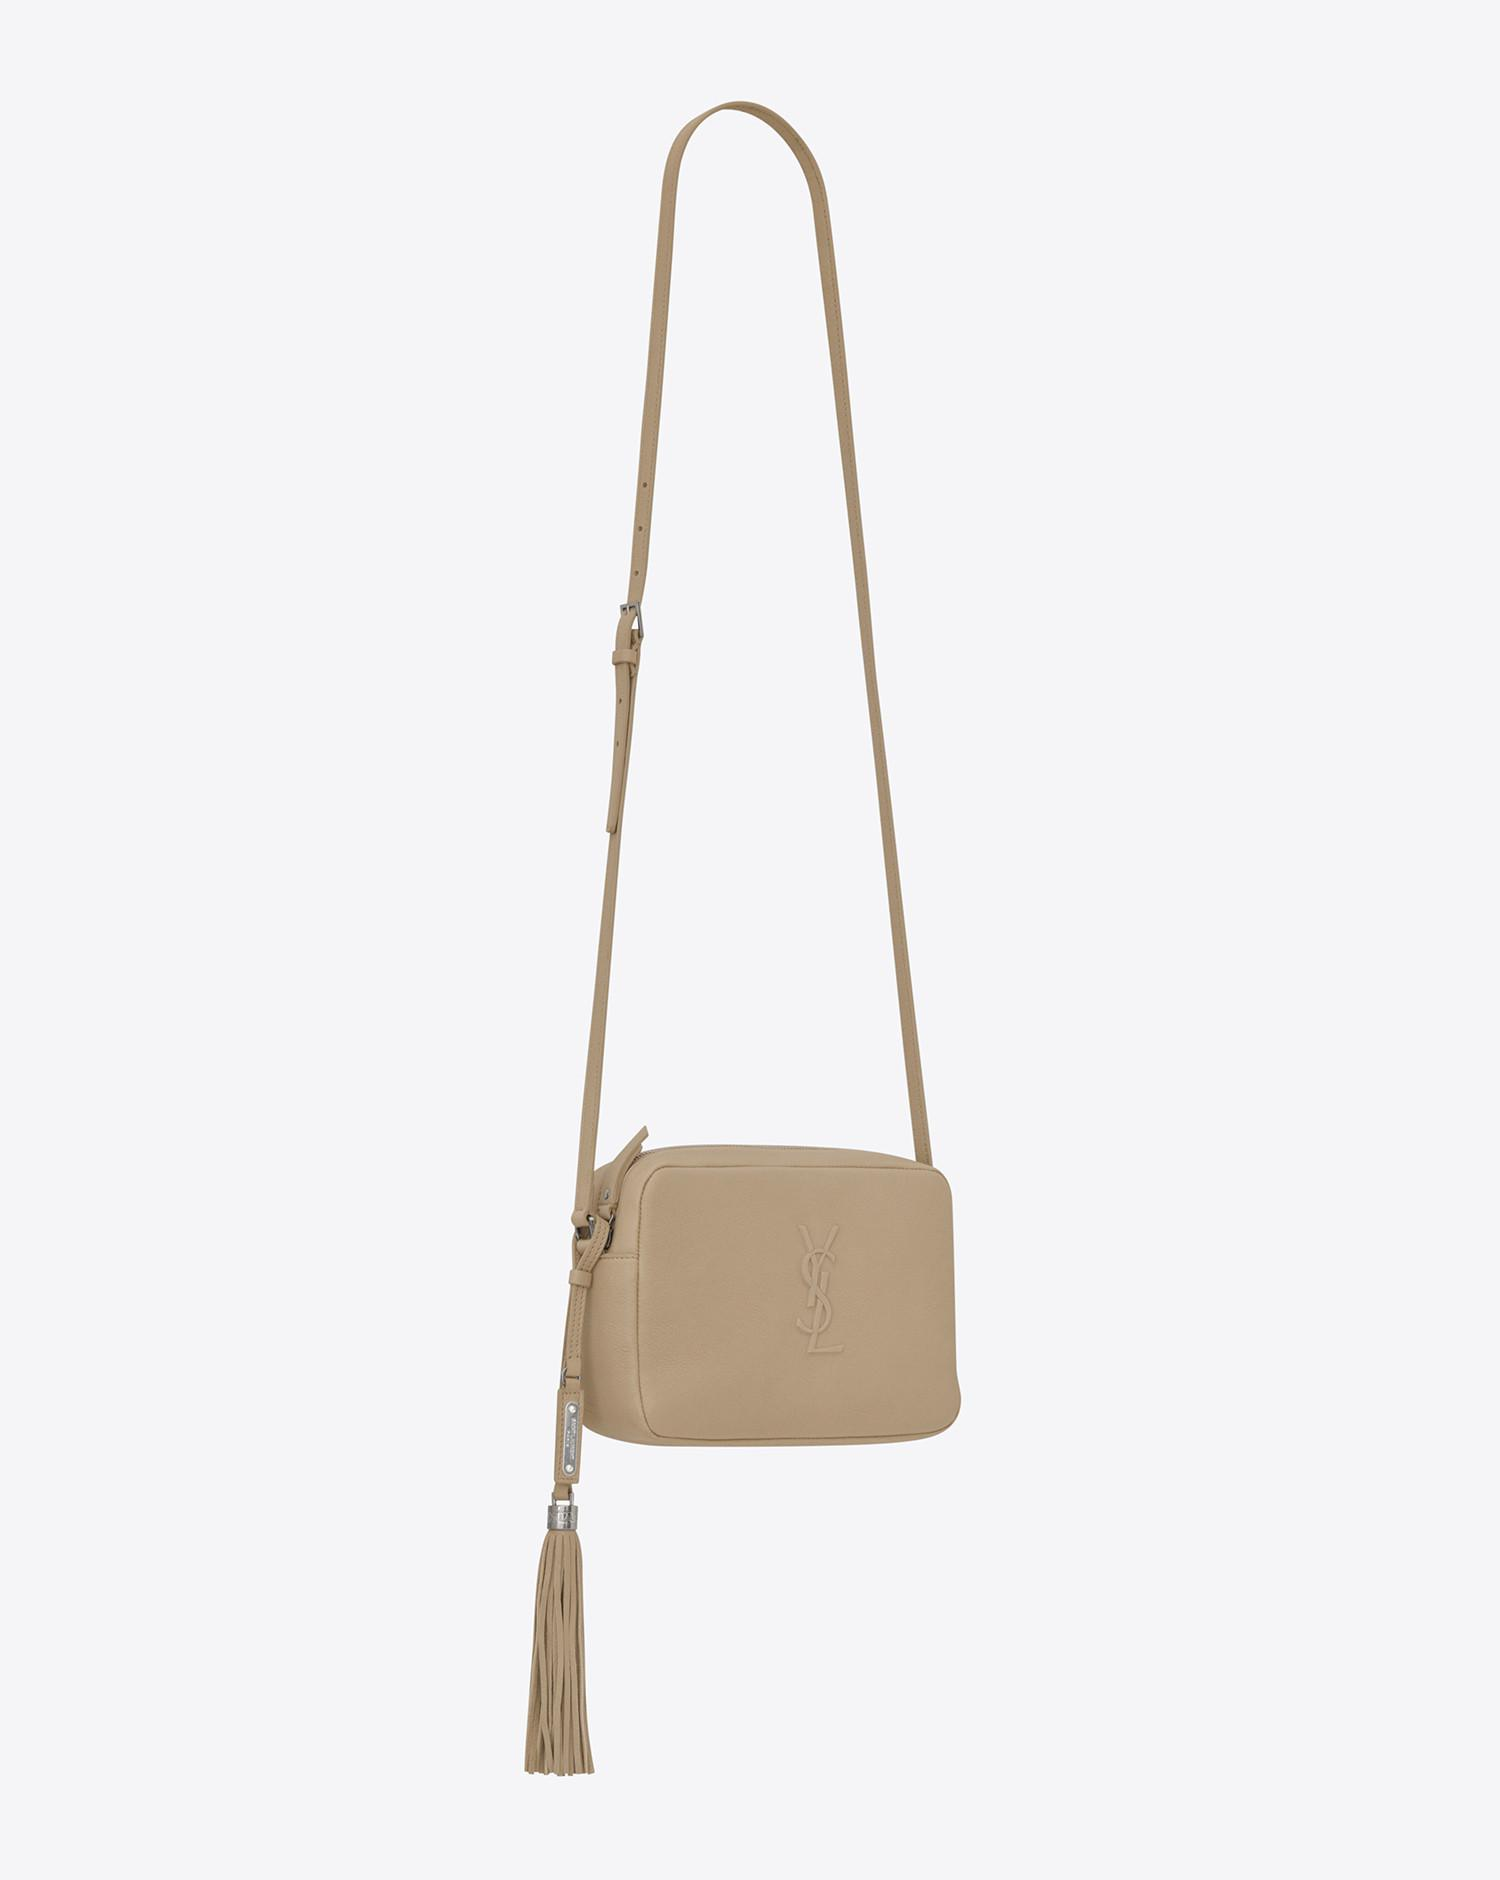 0cc397c3e1a Lyst - Saint Laurent Small Lou Camera Bag In Dark Beige Leather in ...